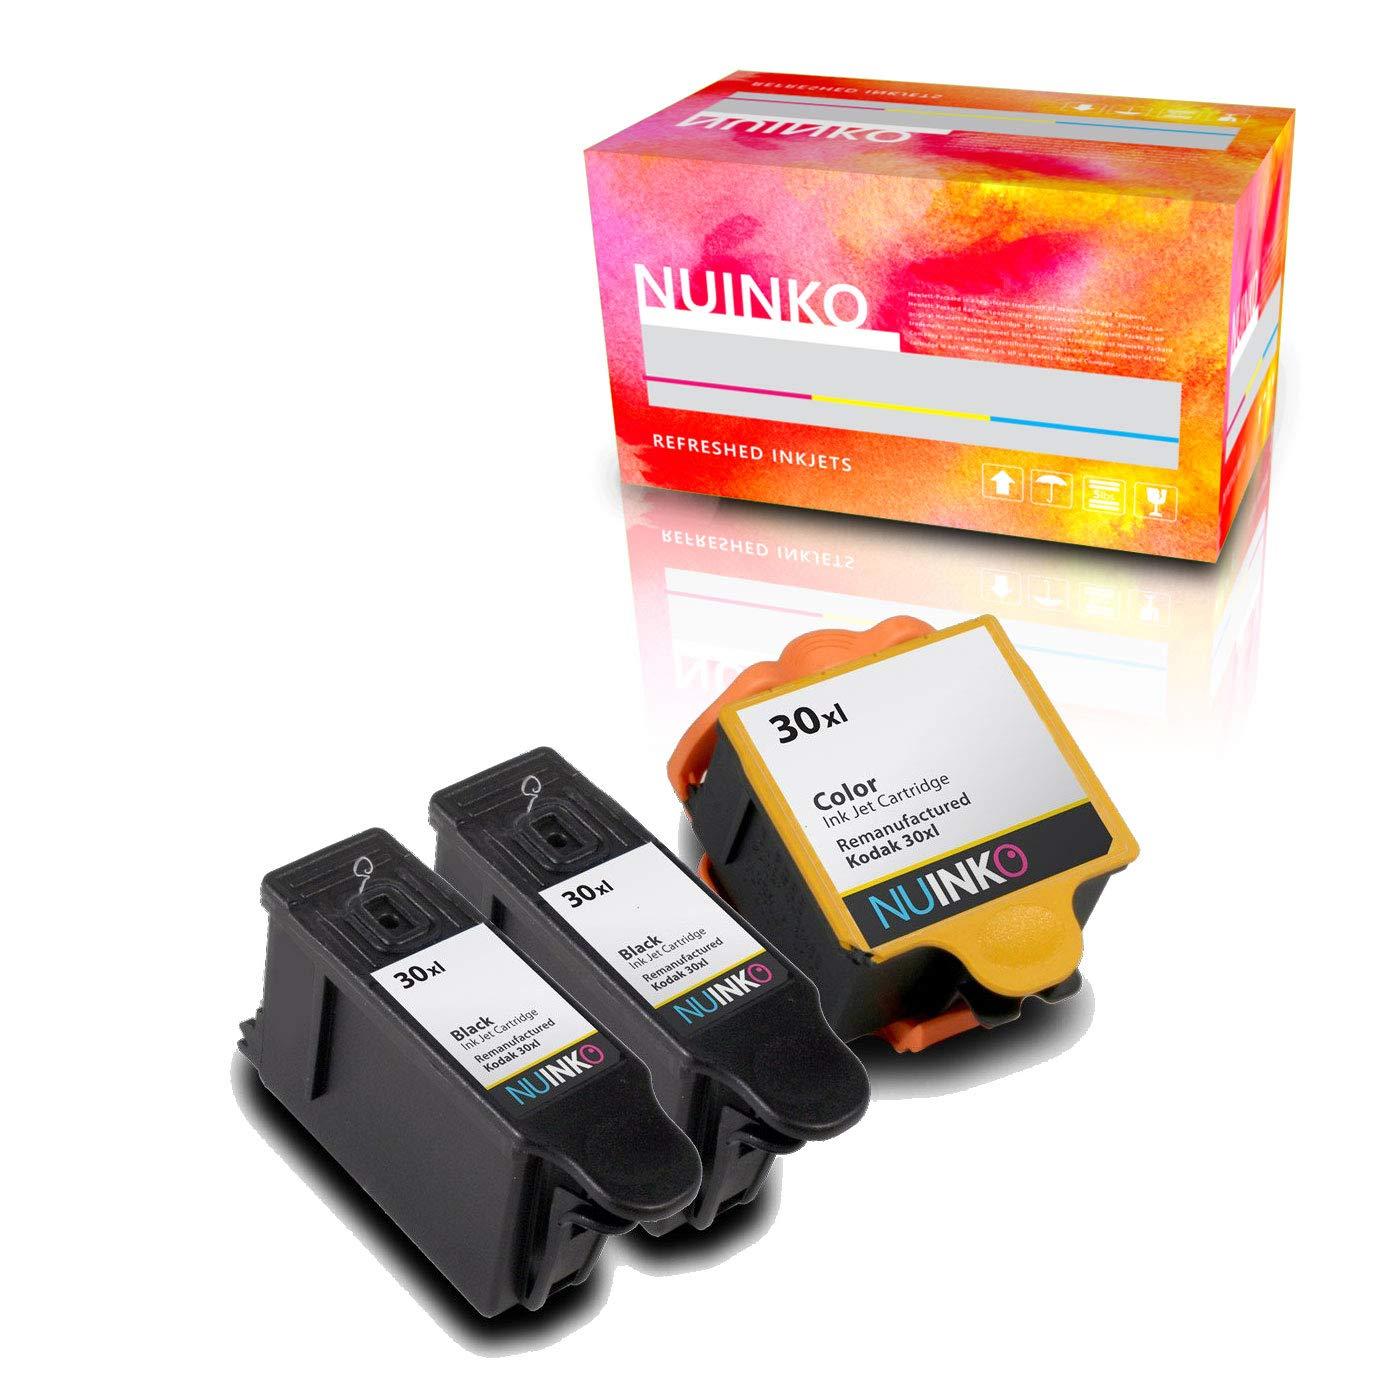 NUINKO 3 Pack Compatible Kodak 30 Ink Cartridges Black and Color for Kodak ESP C310 ESP 3.2 ESP C315 ESP C110 ESP Office 2170 ESP Office 2150 HERO 5.1 ...